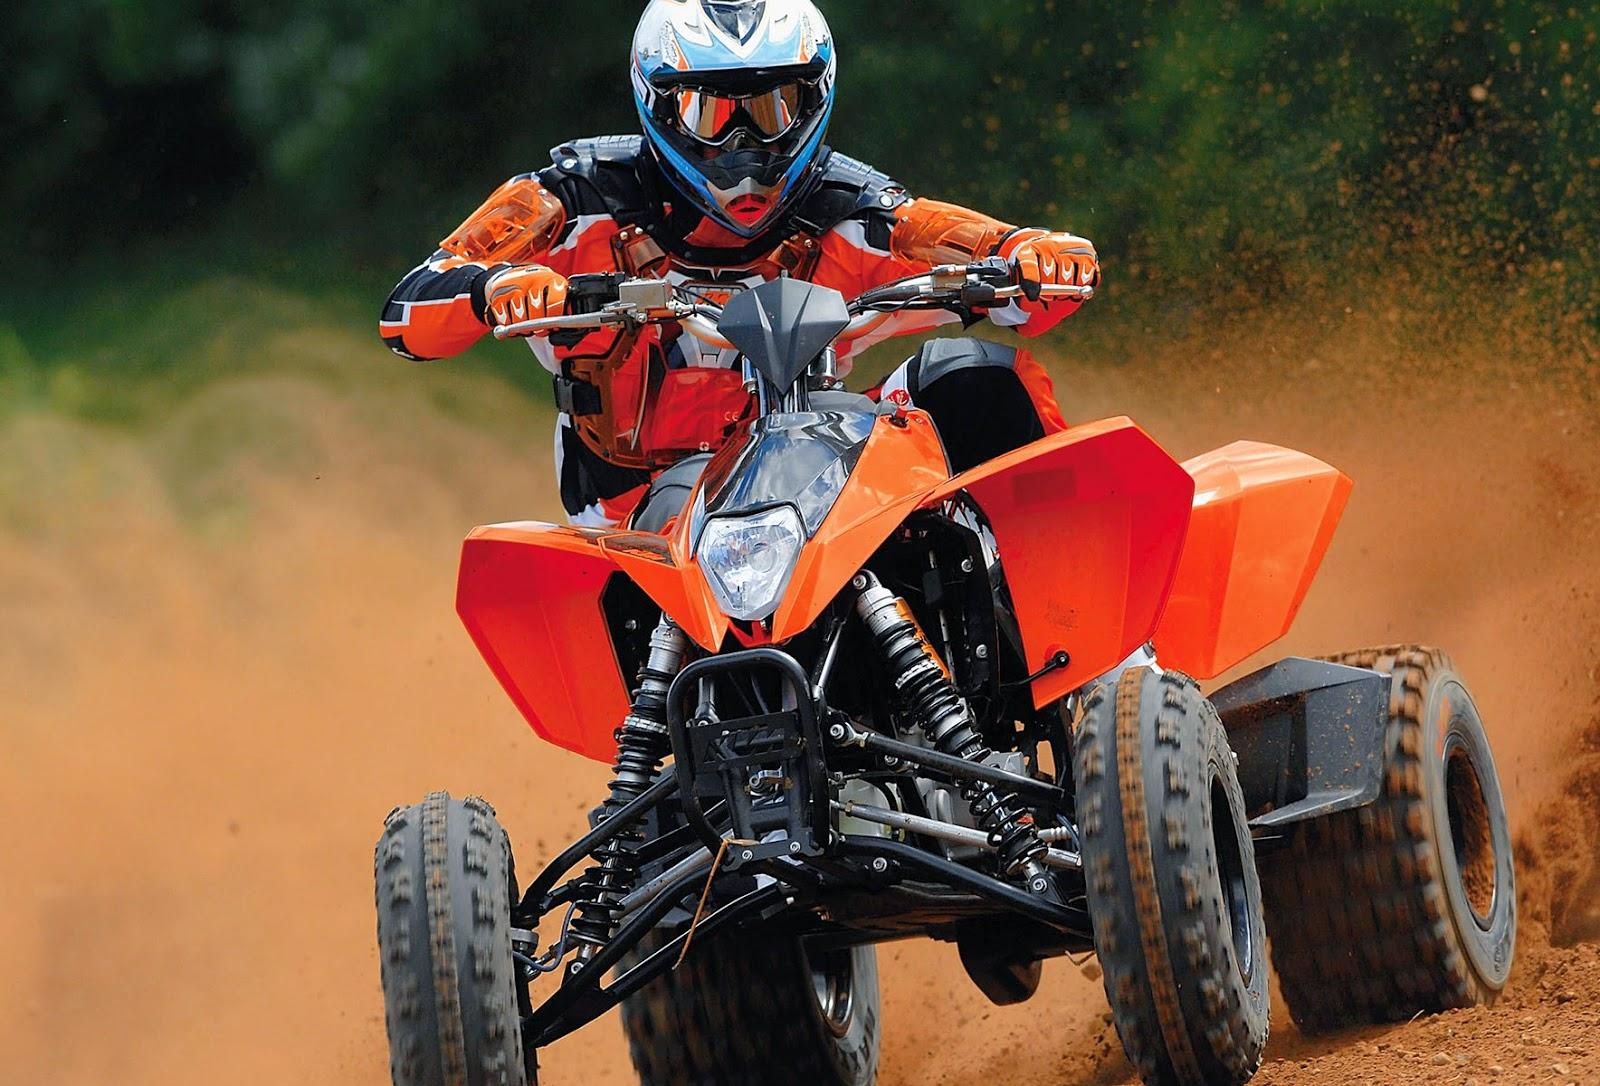 KTM 525 XC ATV Bikes Price